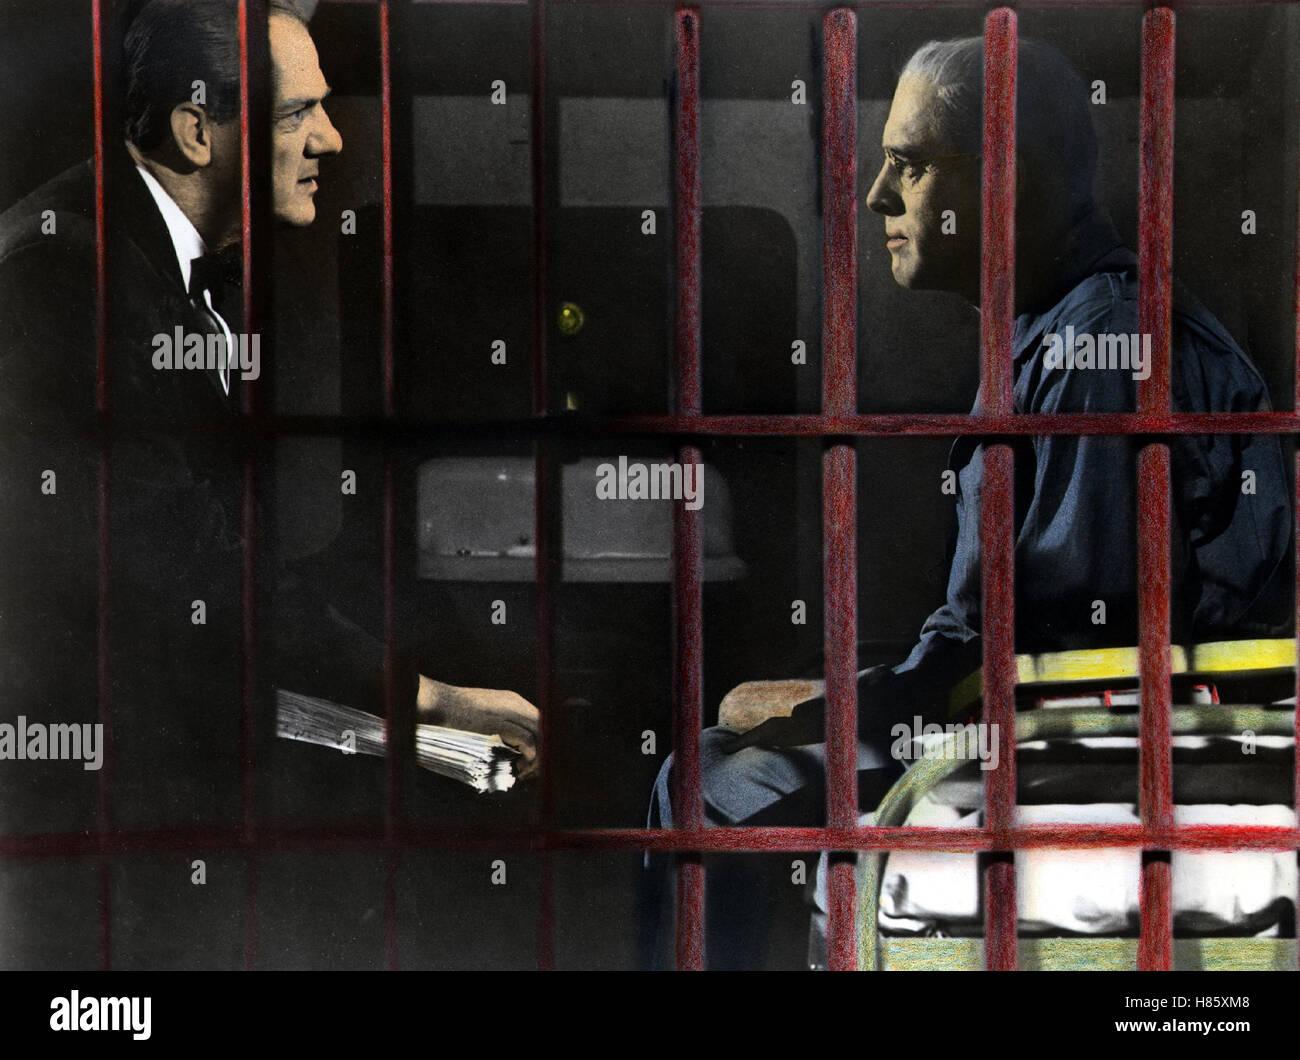 Der Gefangene von Alcatraz, (BIRDMAN OF ALCATRAZ) USA 1961, Regie: John Frankenheimer, KARL MALDEN, BURT LANCASTER, Stock Photo